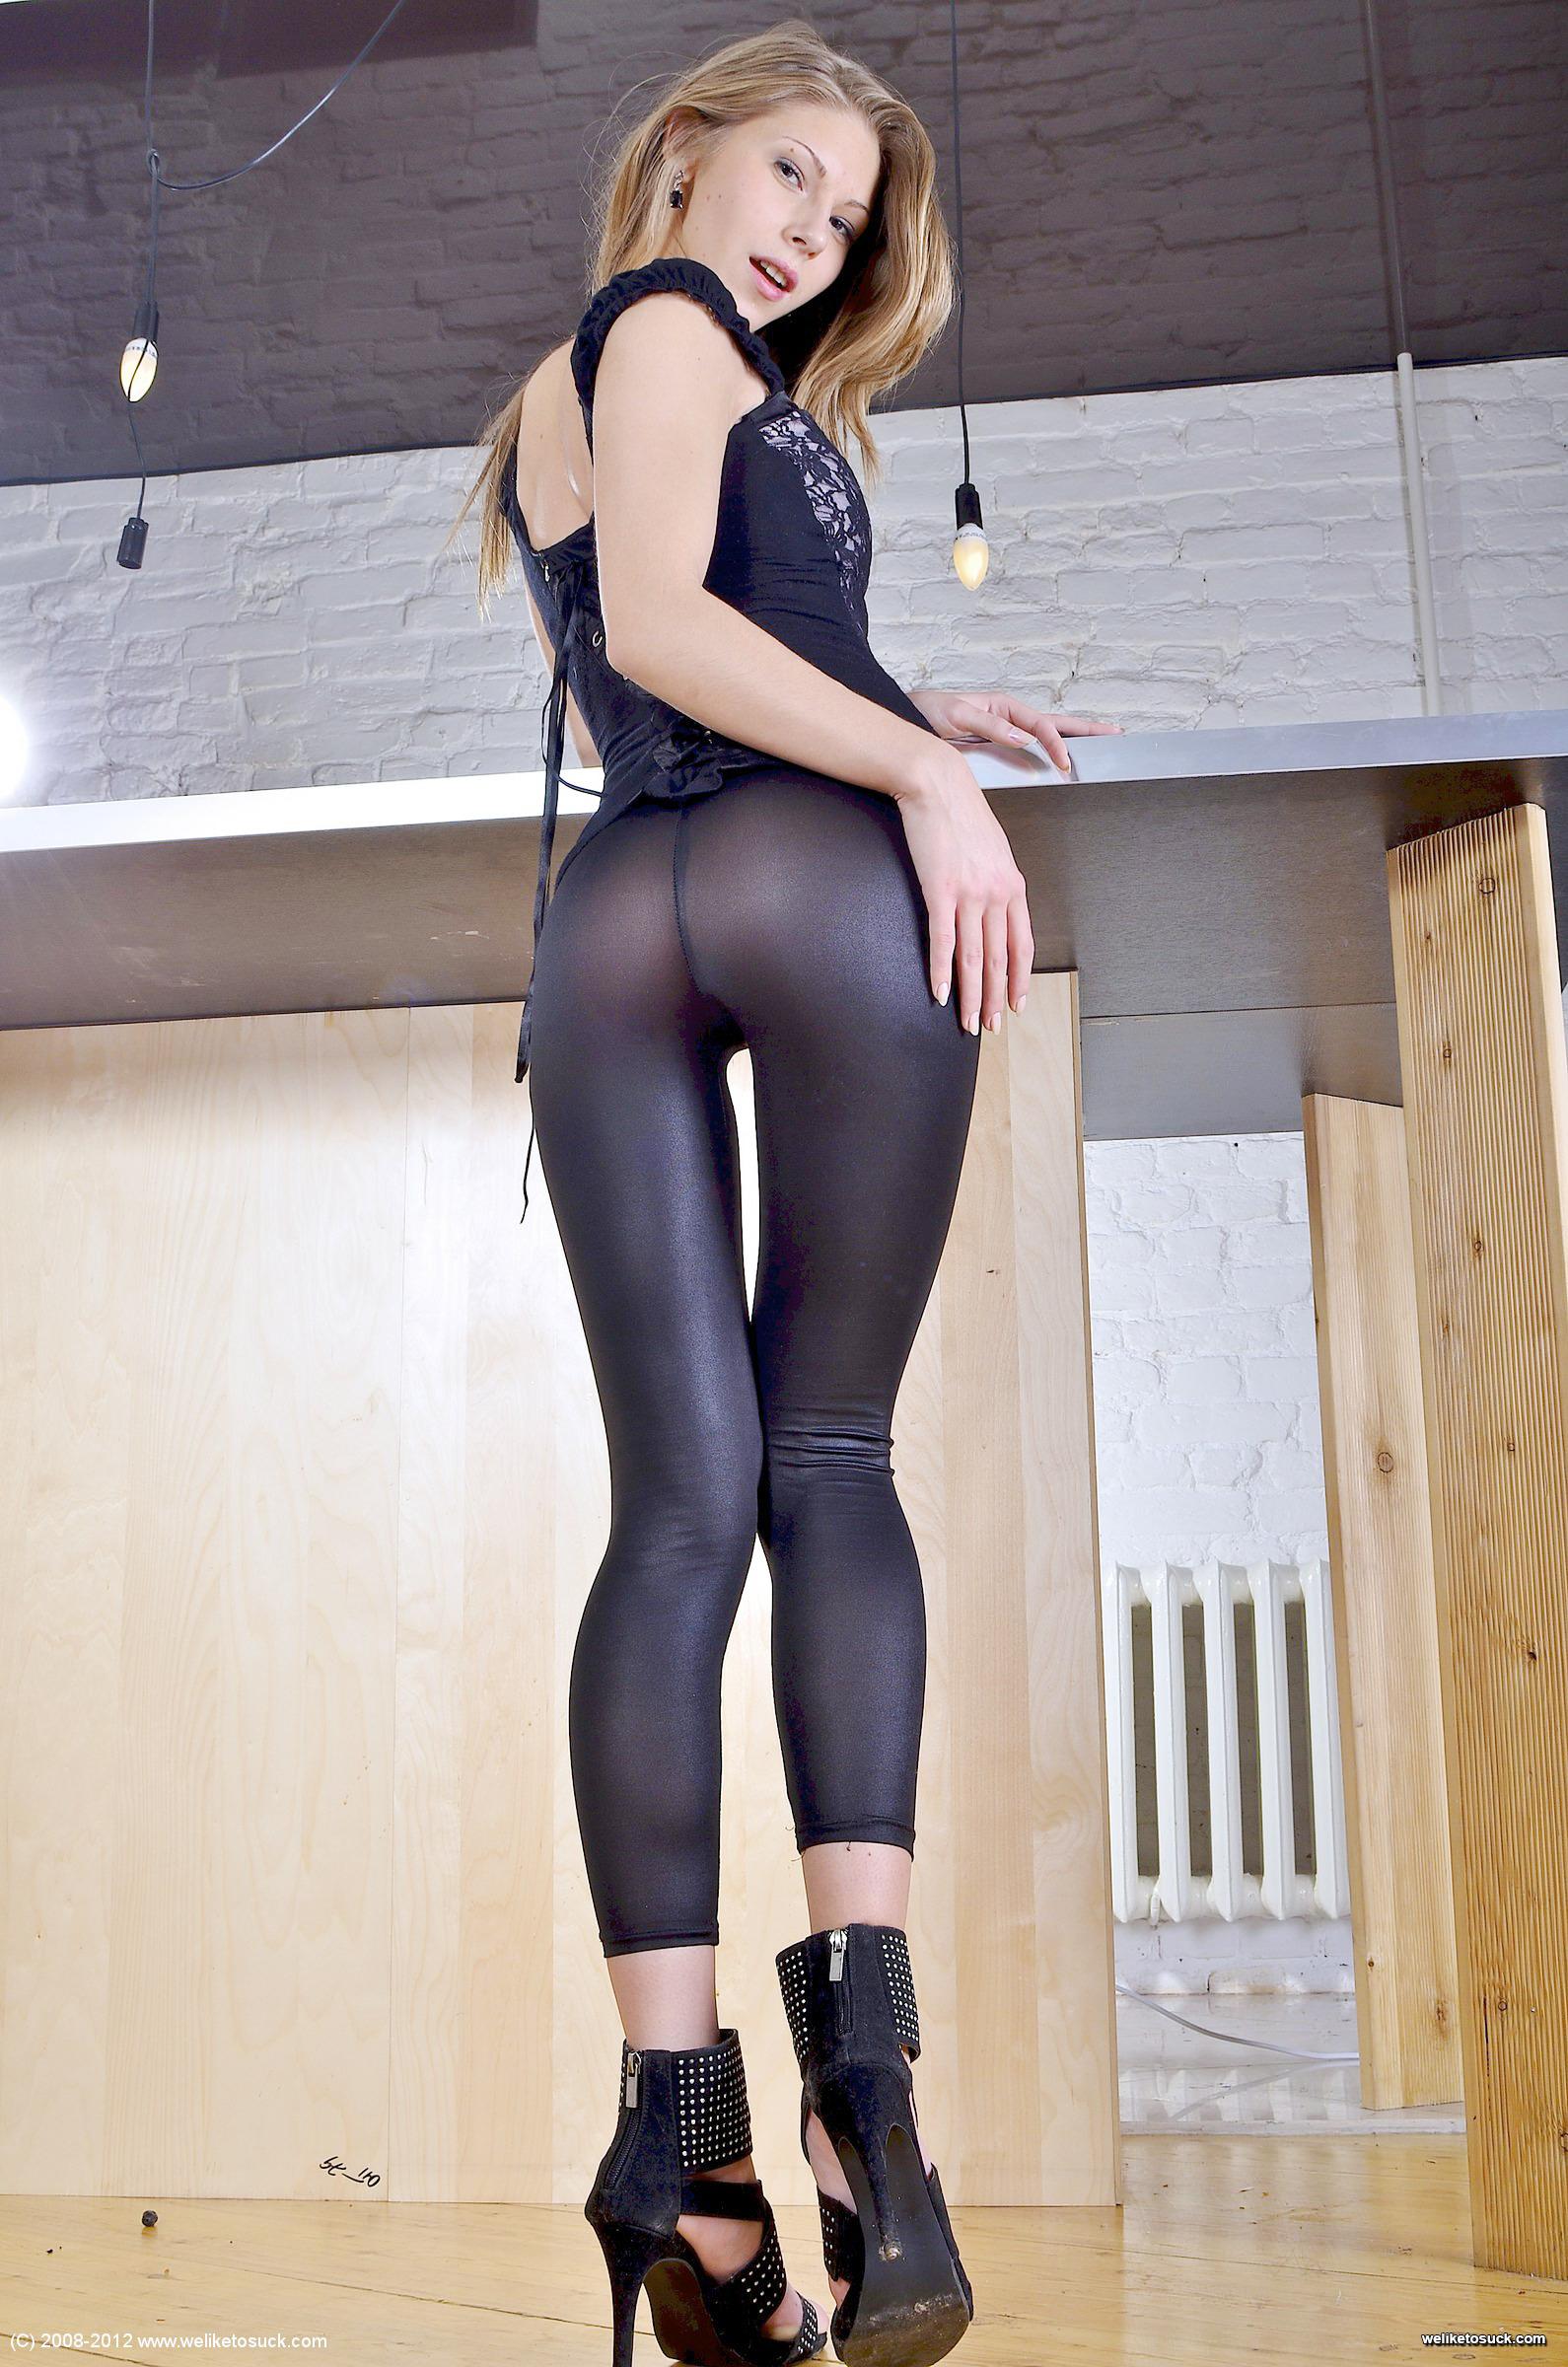 porno-russkih-hudenkih-devochek